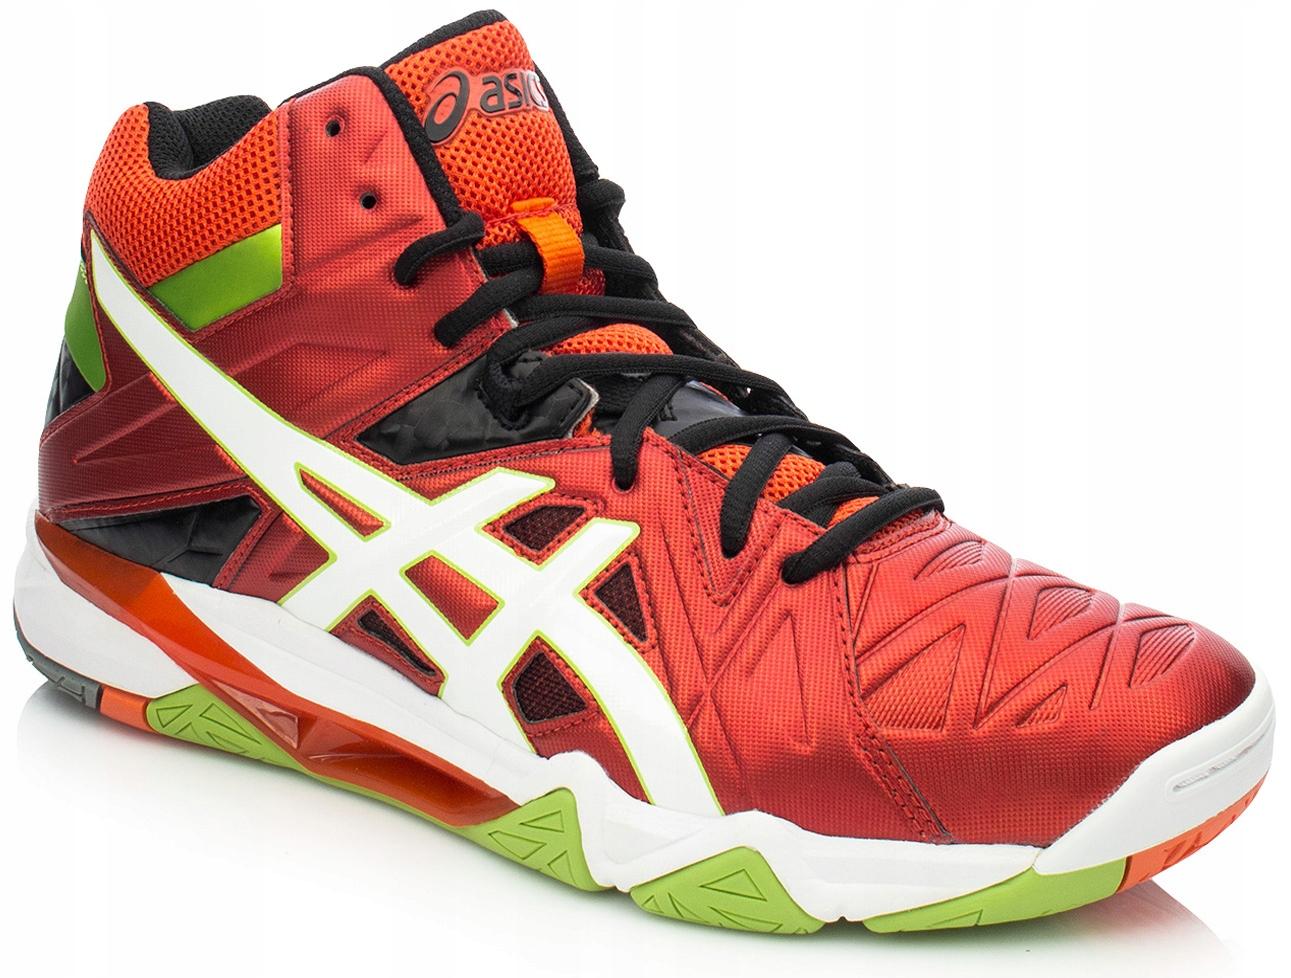 Asics Gel-Sensei 6 MT Volejbalové topánky 50.5